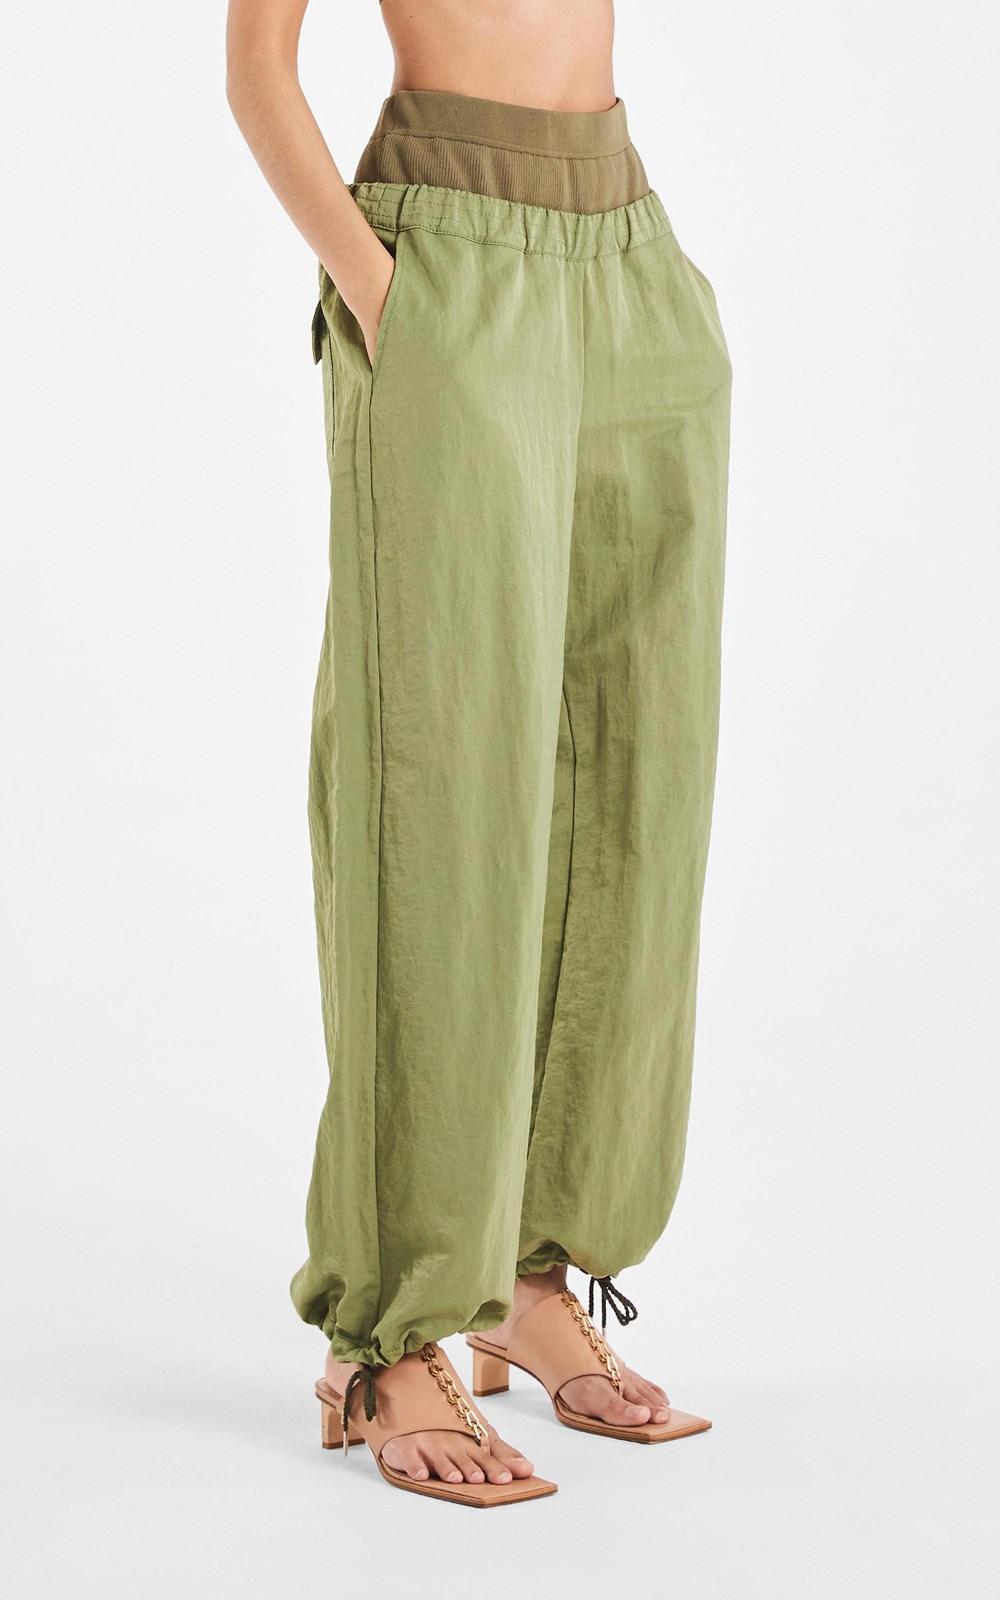 Pants | NYLON TRACKPANT